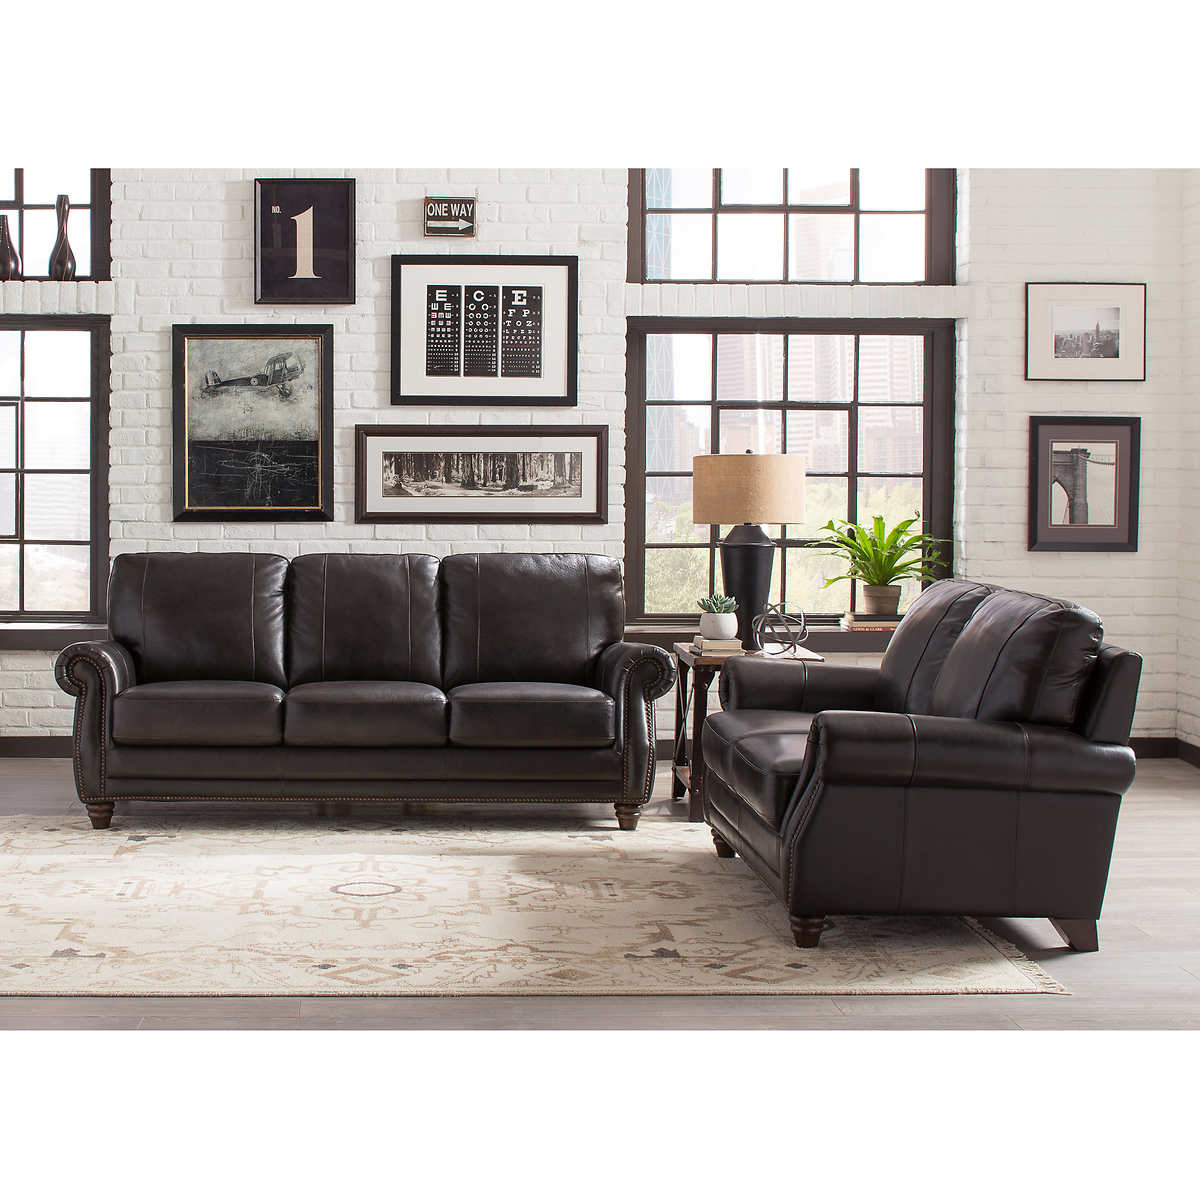 landis 2 piece top grain leather set sofa durab